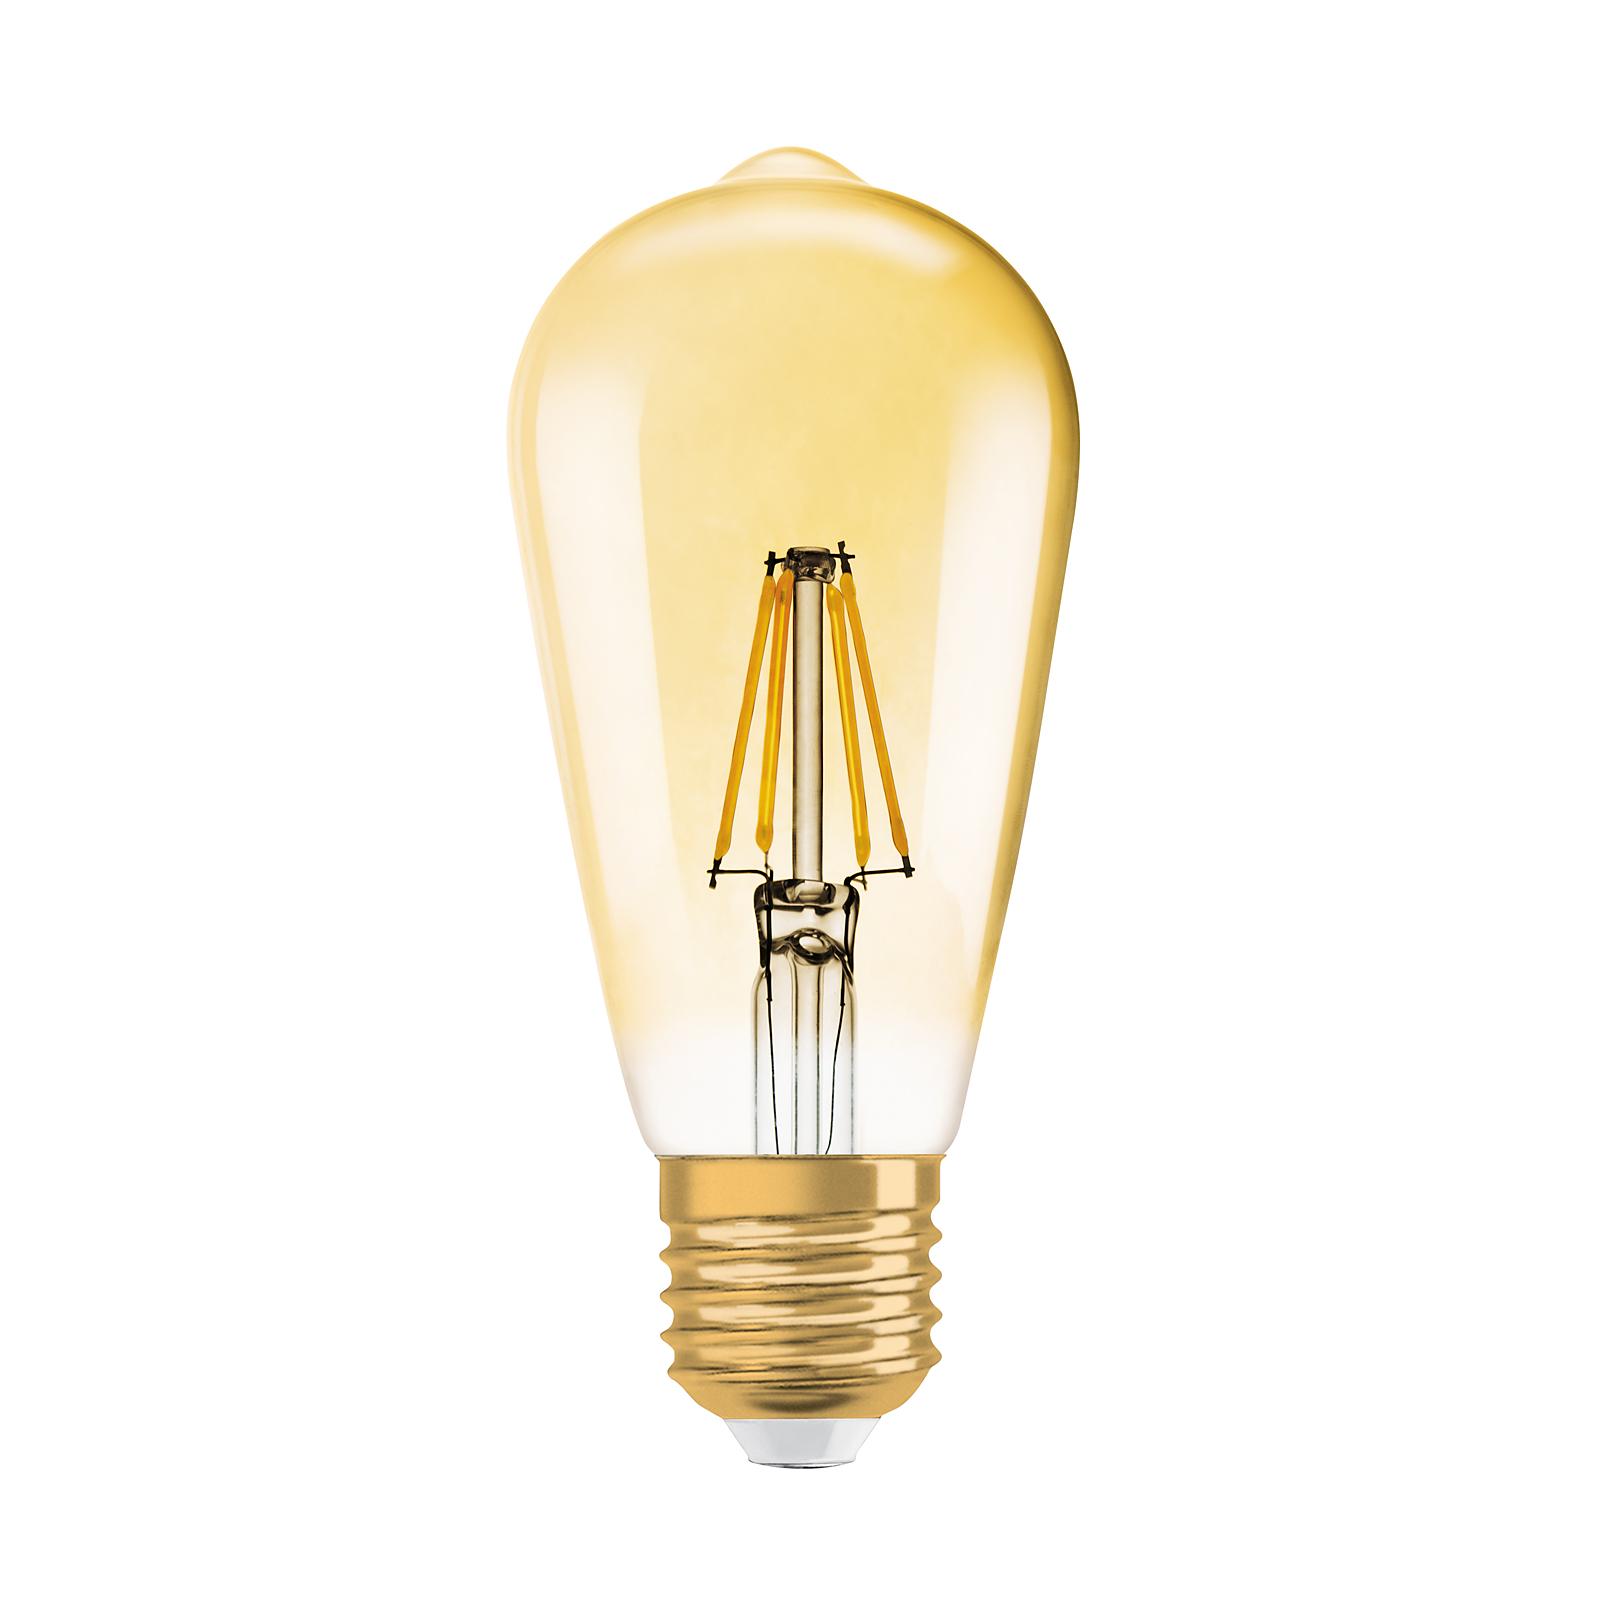 Led lampen e27 afdecker led lampen e27 osram led lampe edition 1906 e27 4w edison 35 w parisarafo Images